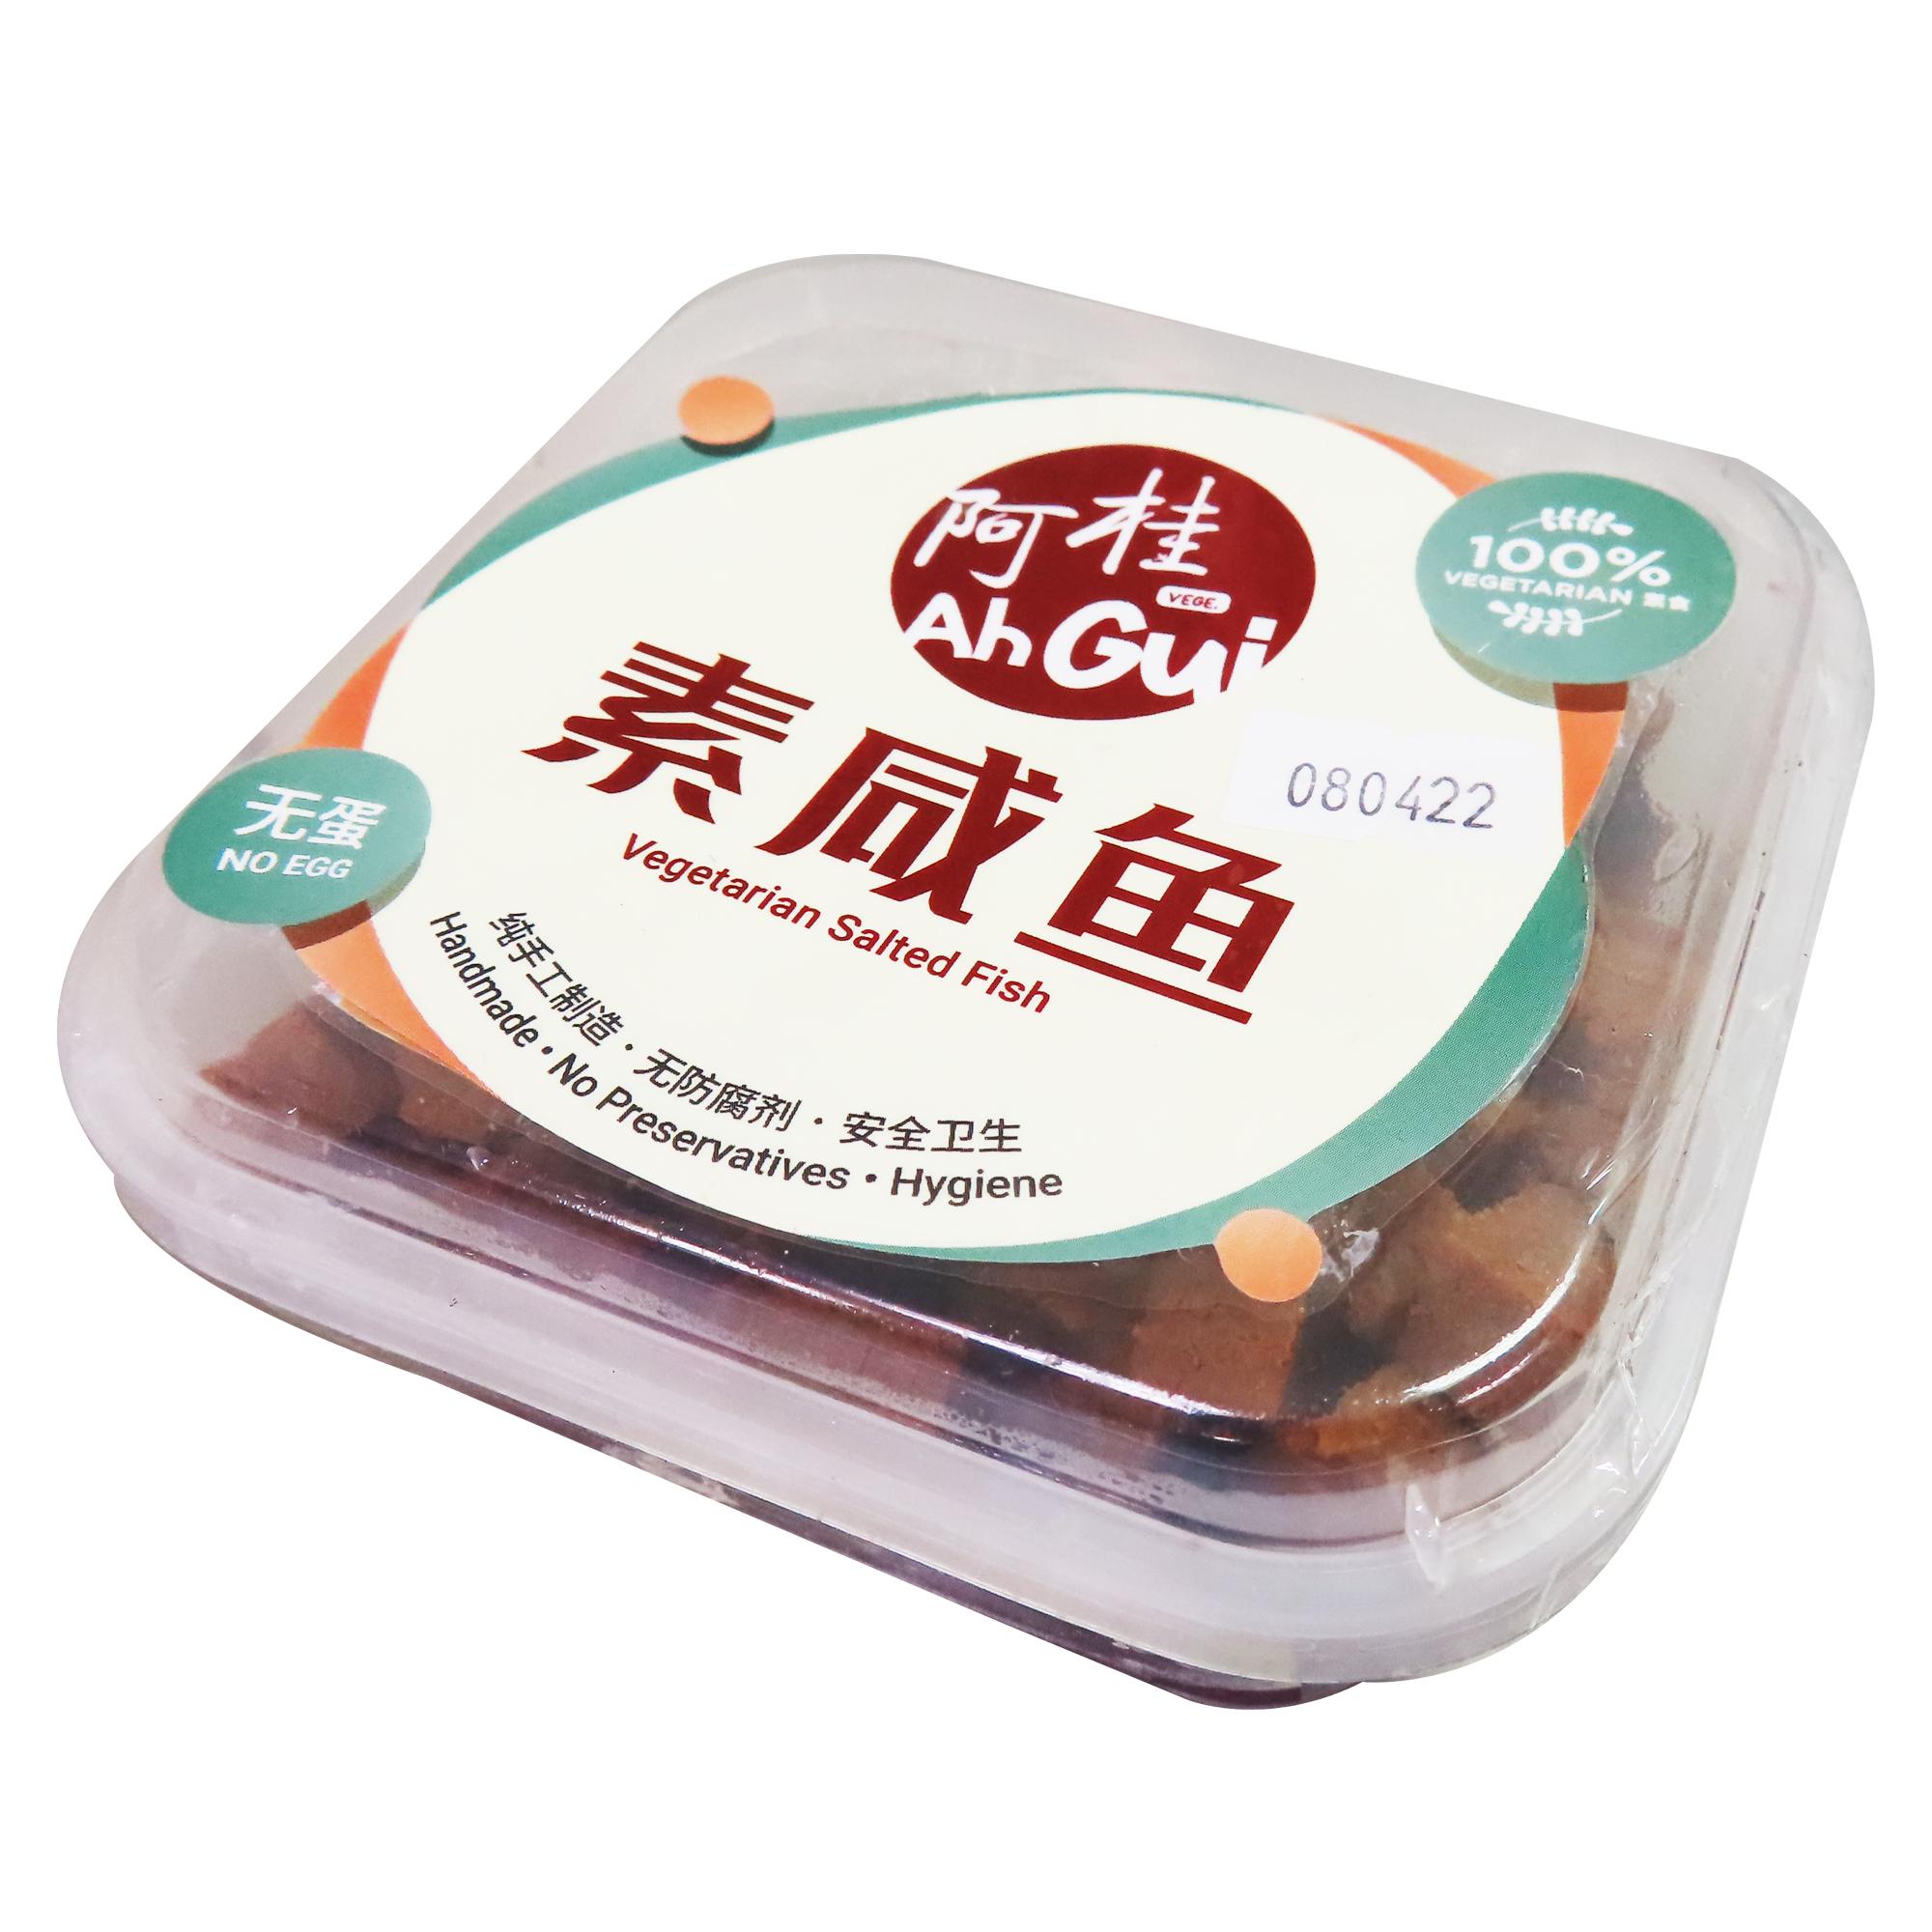 Image AG Salted Fish 阿桂素咸鱼 200grams